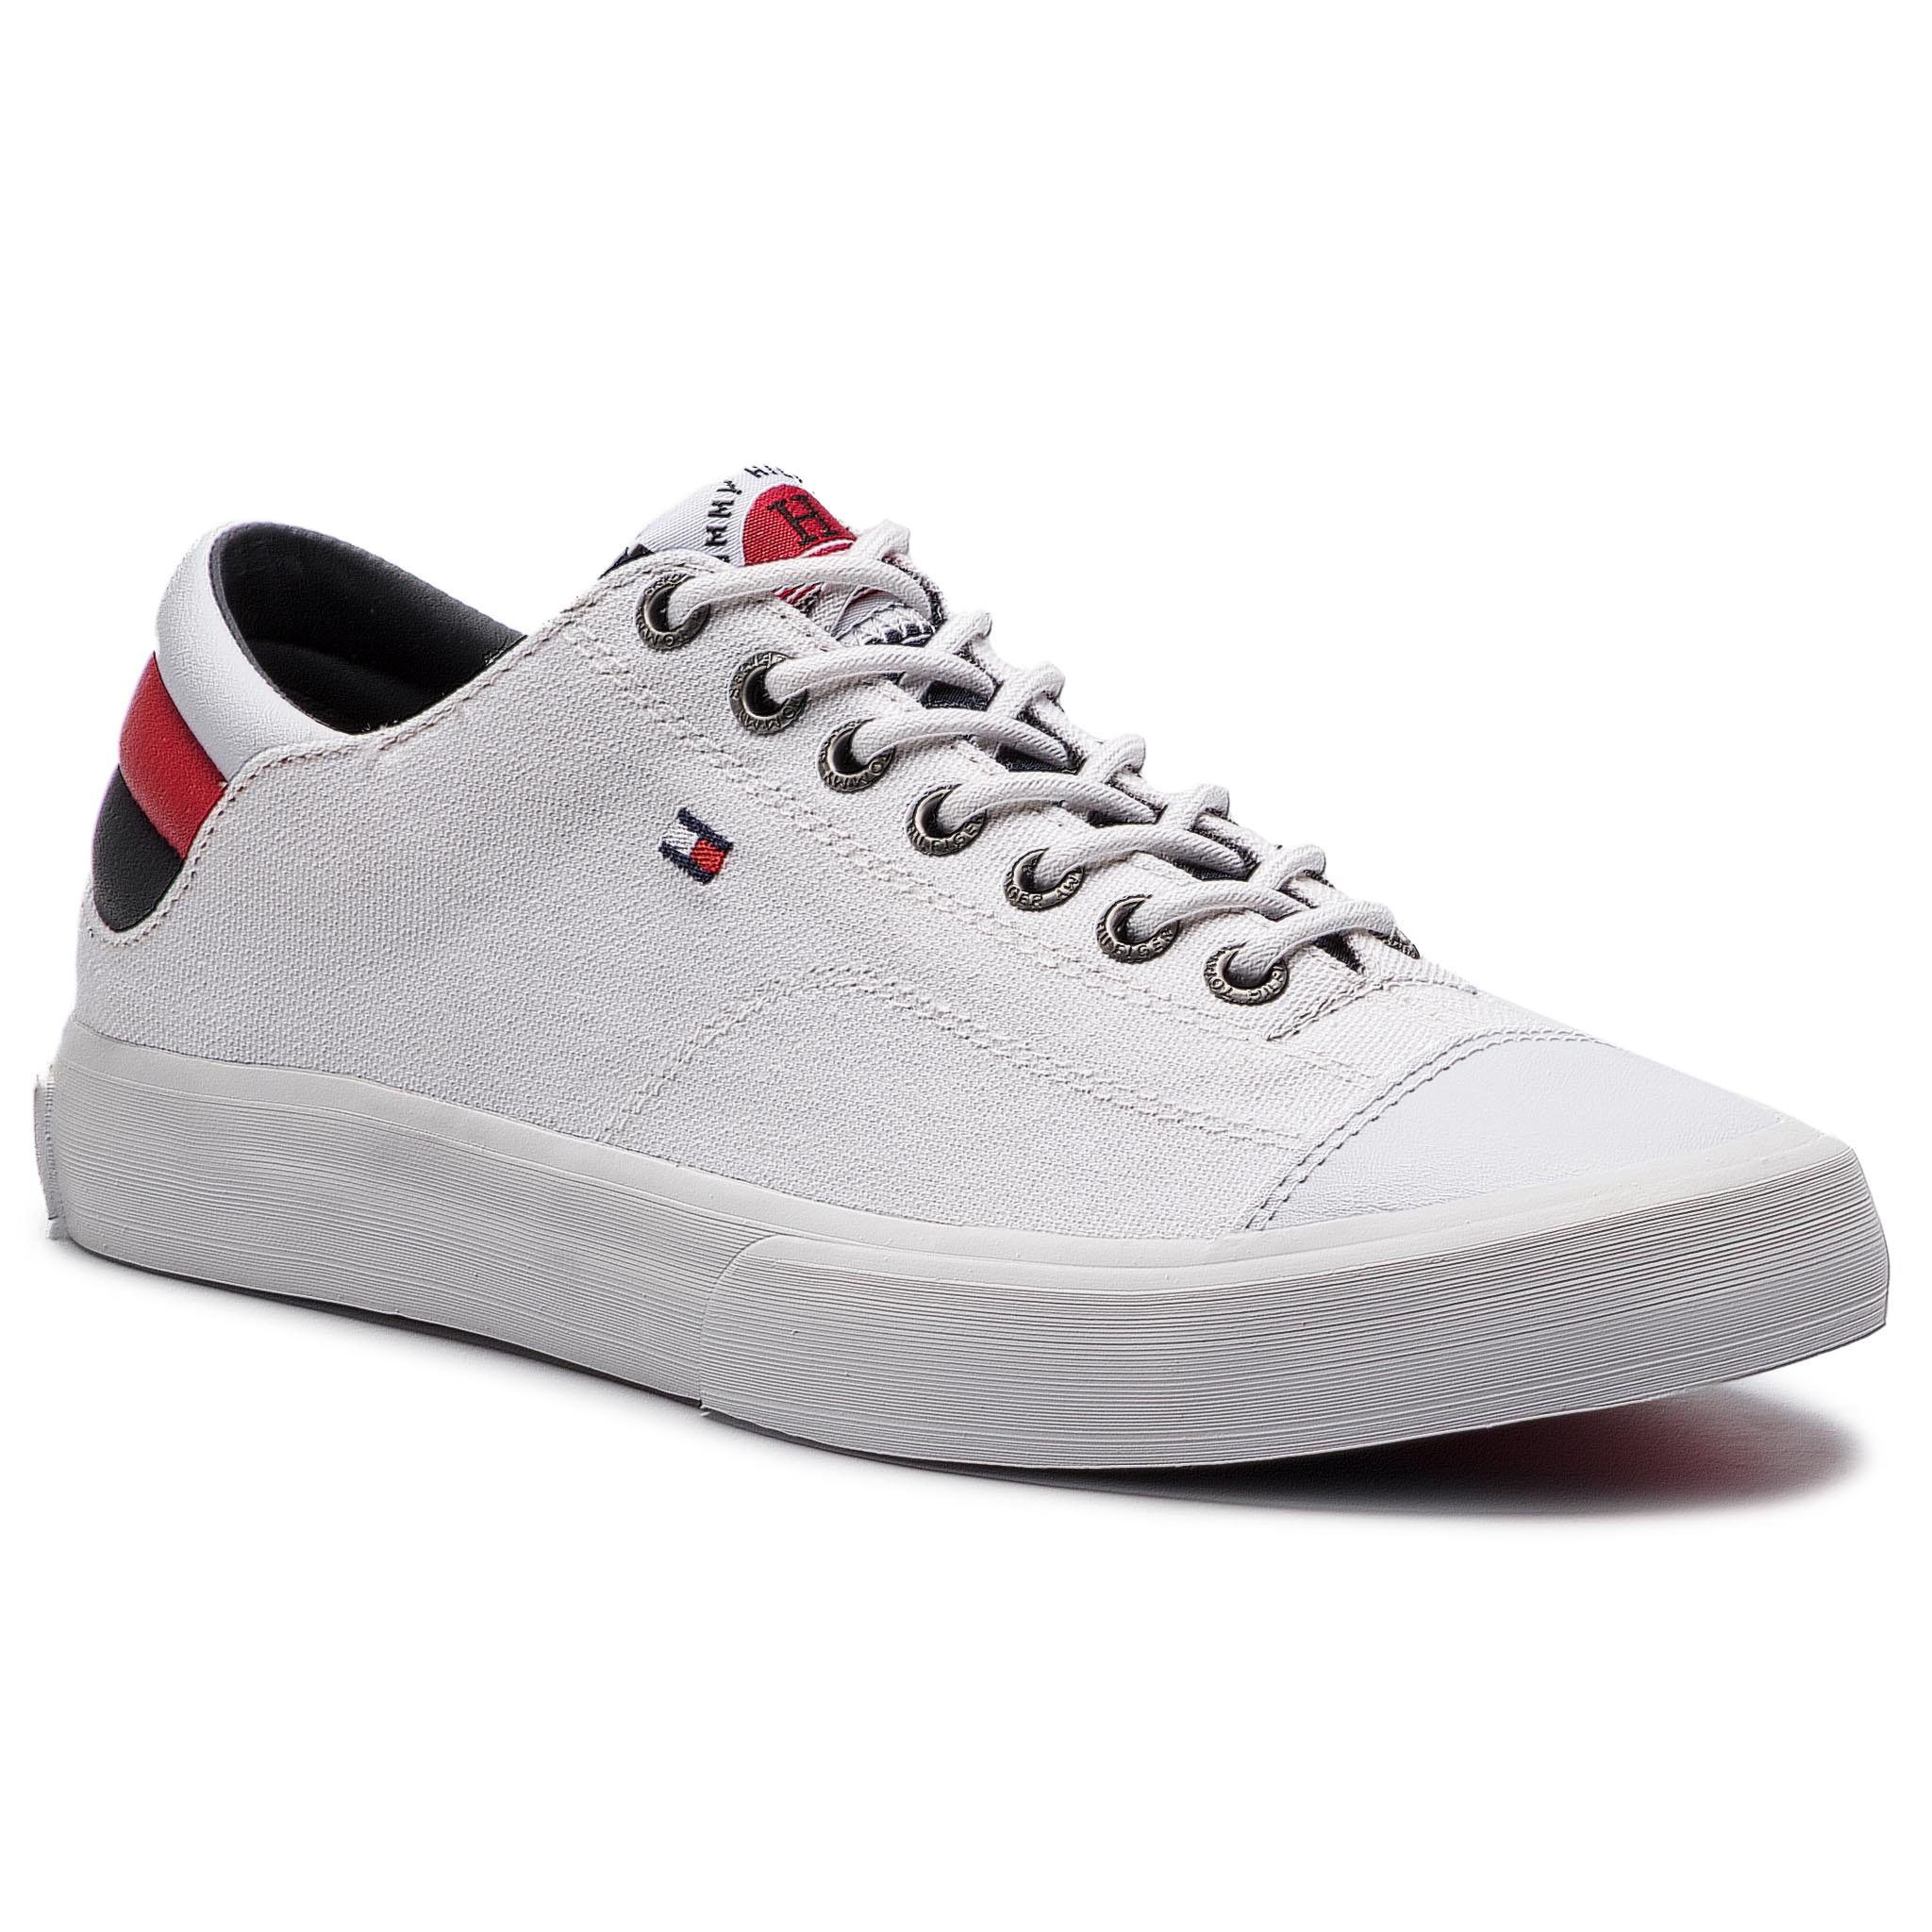 48ffc1e1acb4 Plimsolls TOMMY HILFIGER - Iconic Long Lace Sneaker FM0FM01536 ...